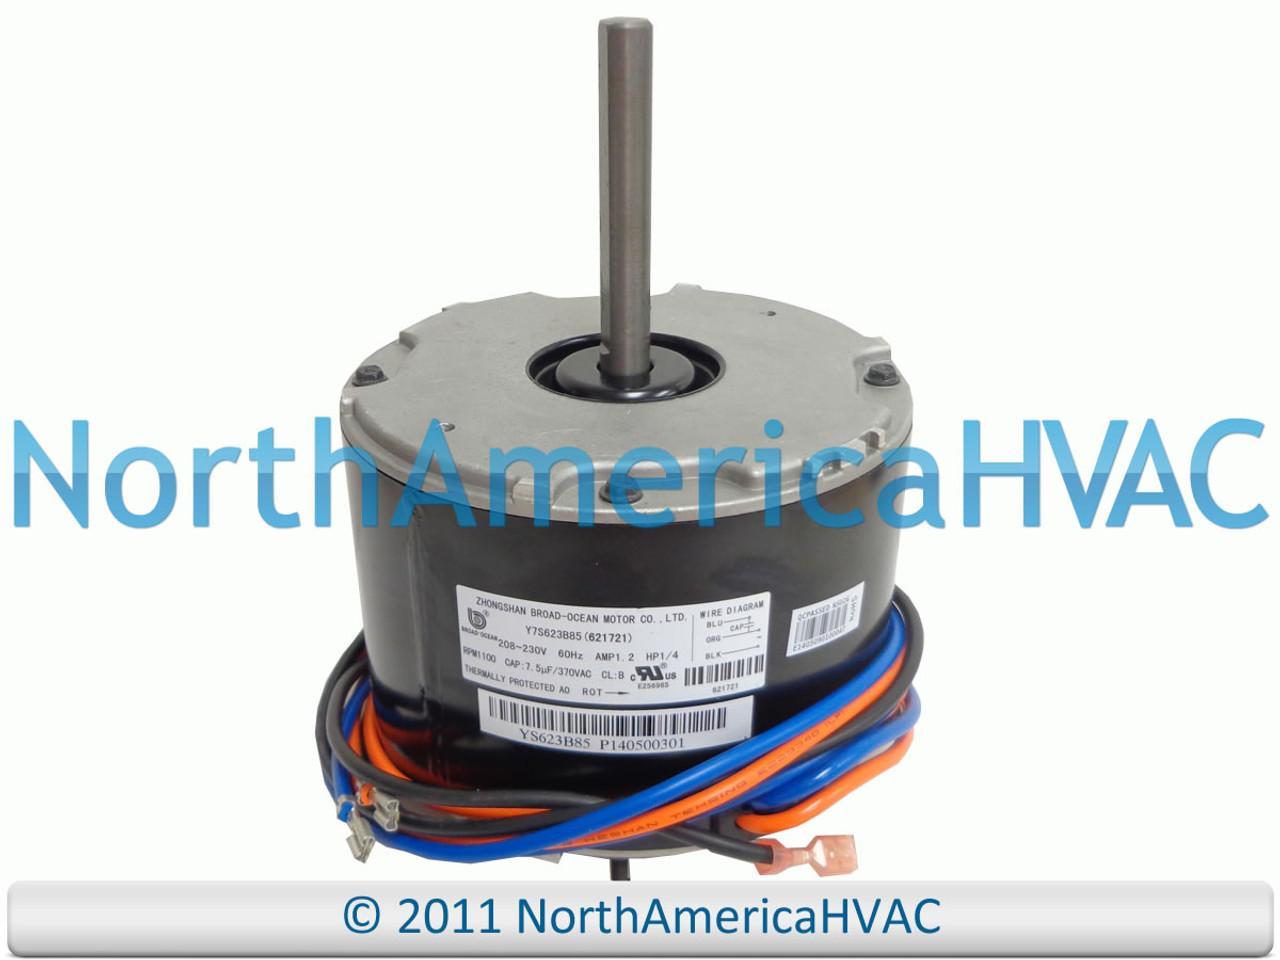 [DIAGRAM_38DE]  OEM Nordyne Intertherm Miller Condenser FAN MOTOR 1/4 621721 6217210  208-230v - North America HVAC | Intertherm Wiring Diagram Condenser |  | North America HVAC